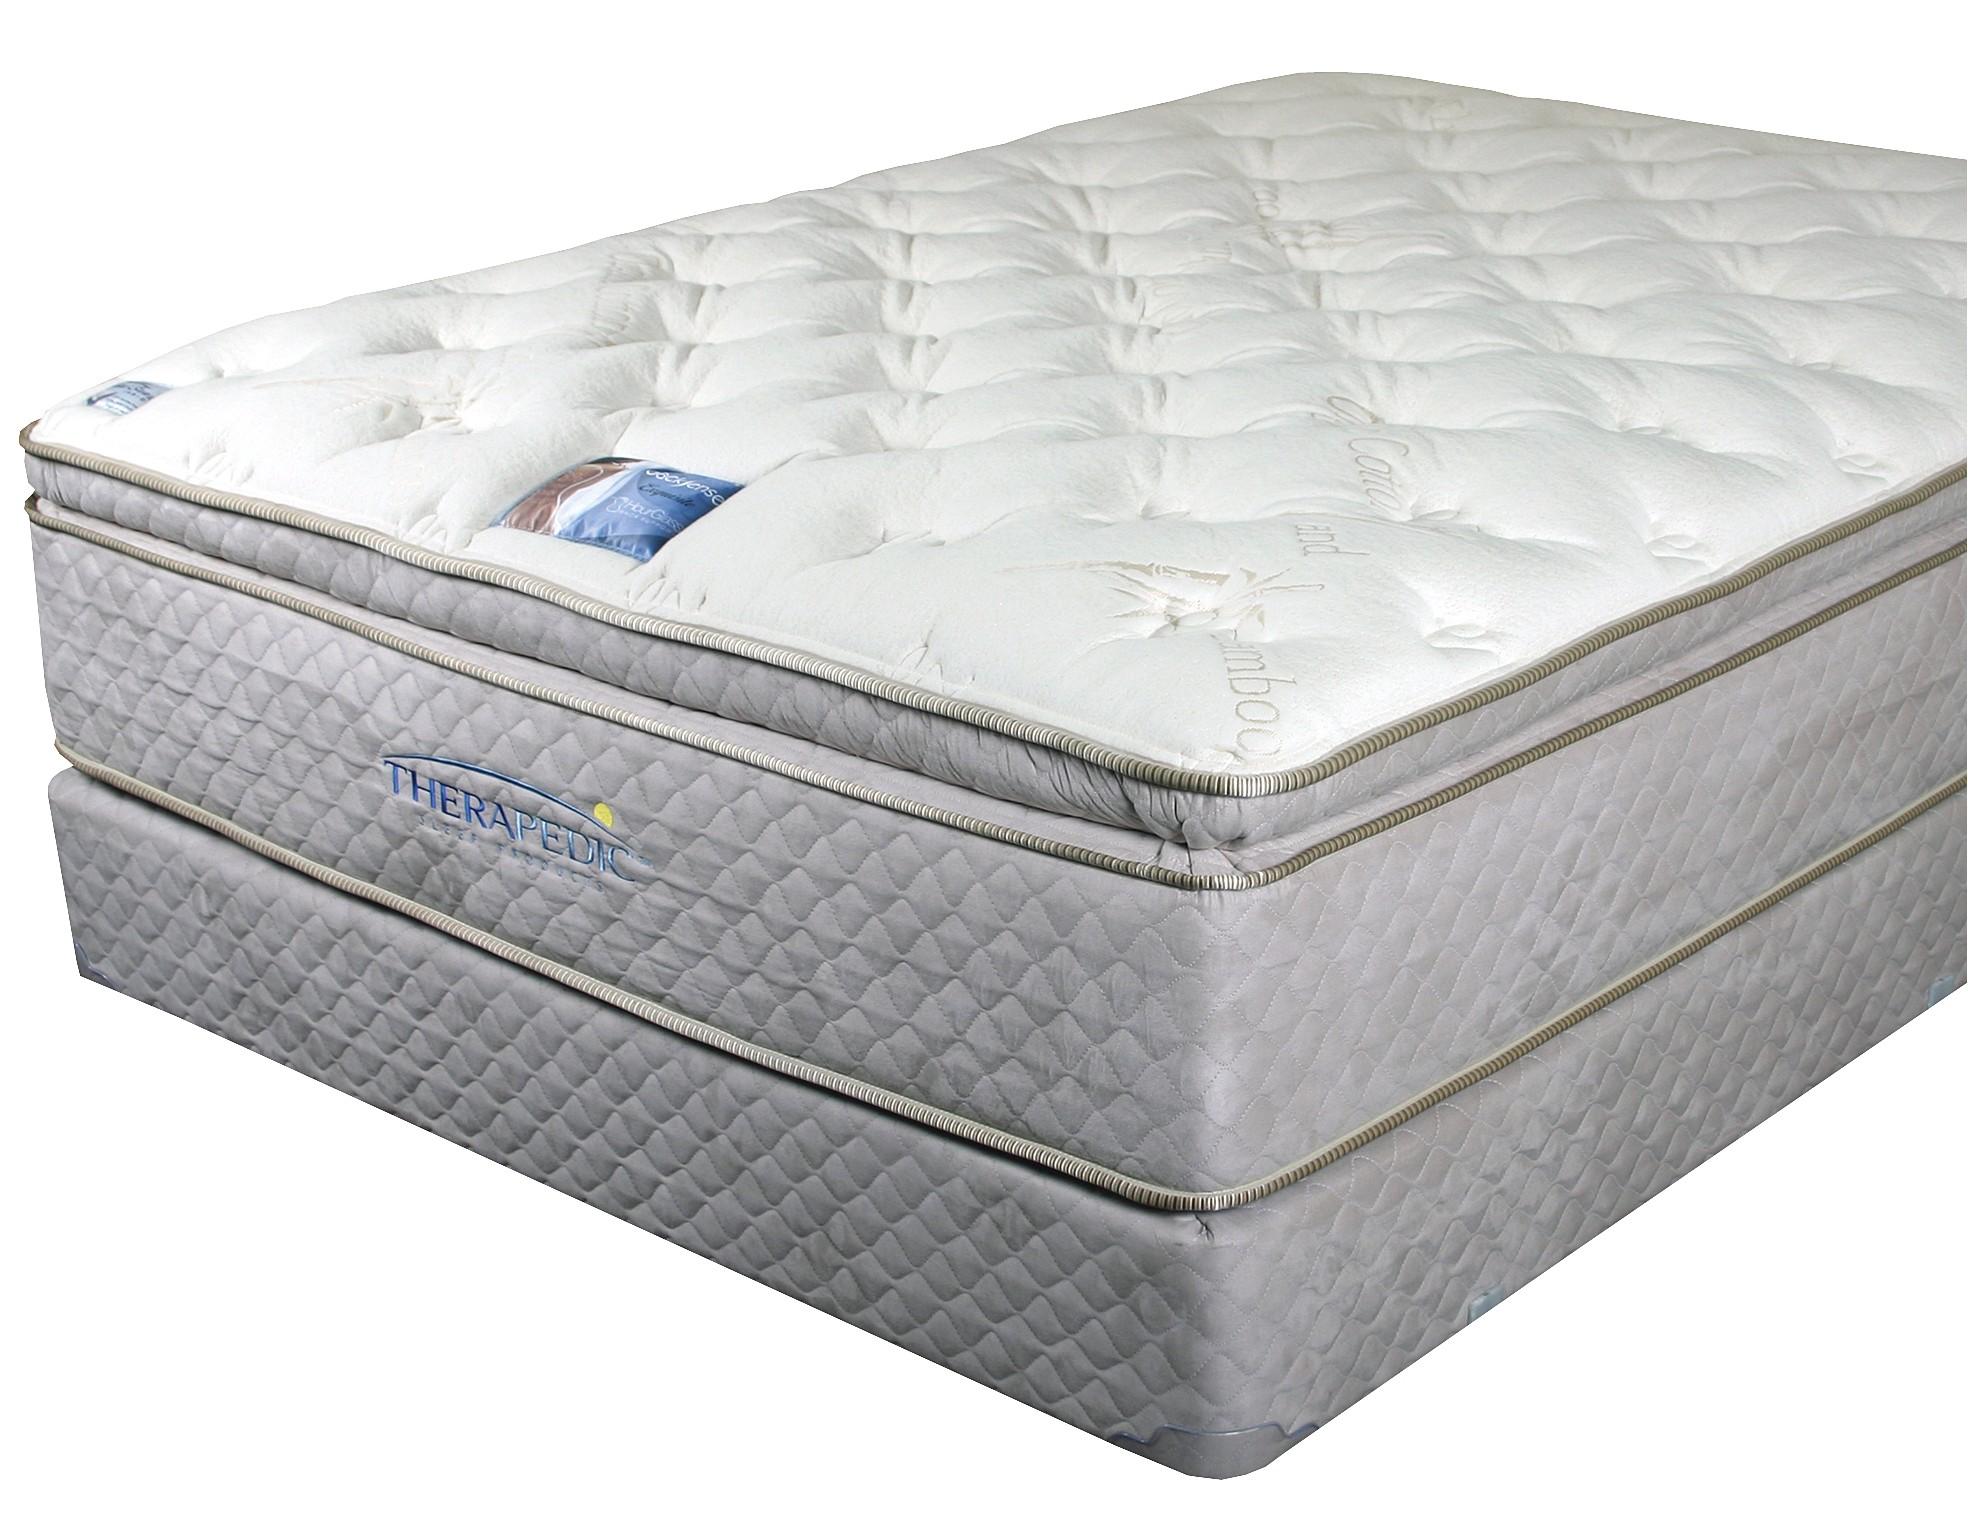 therapedic backsense elite plush latex pillow top legacy